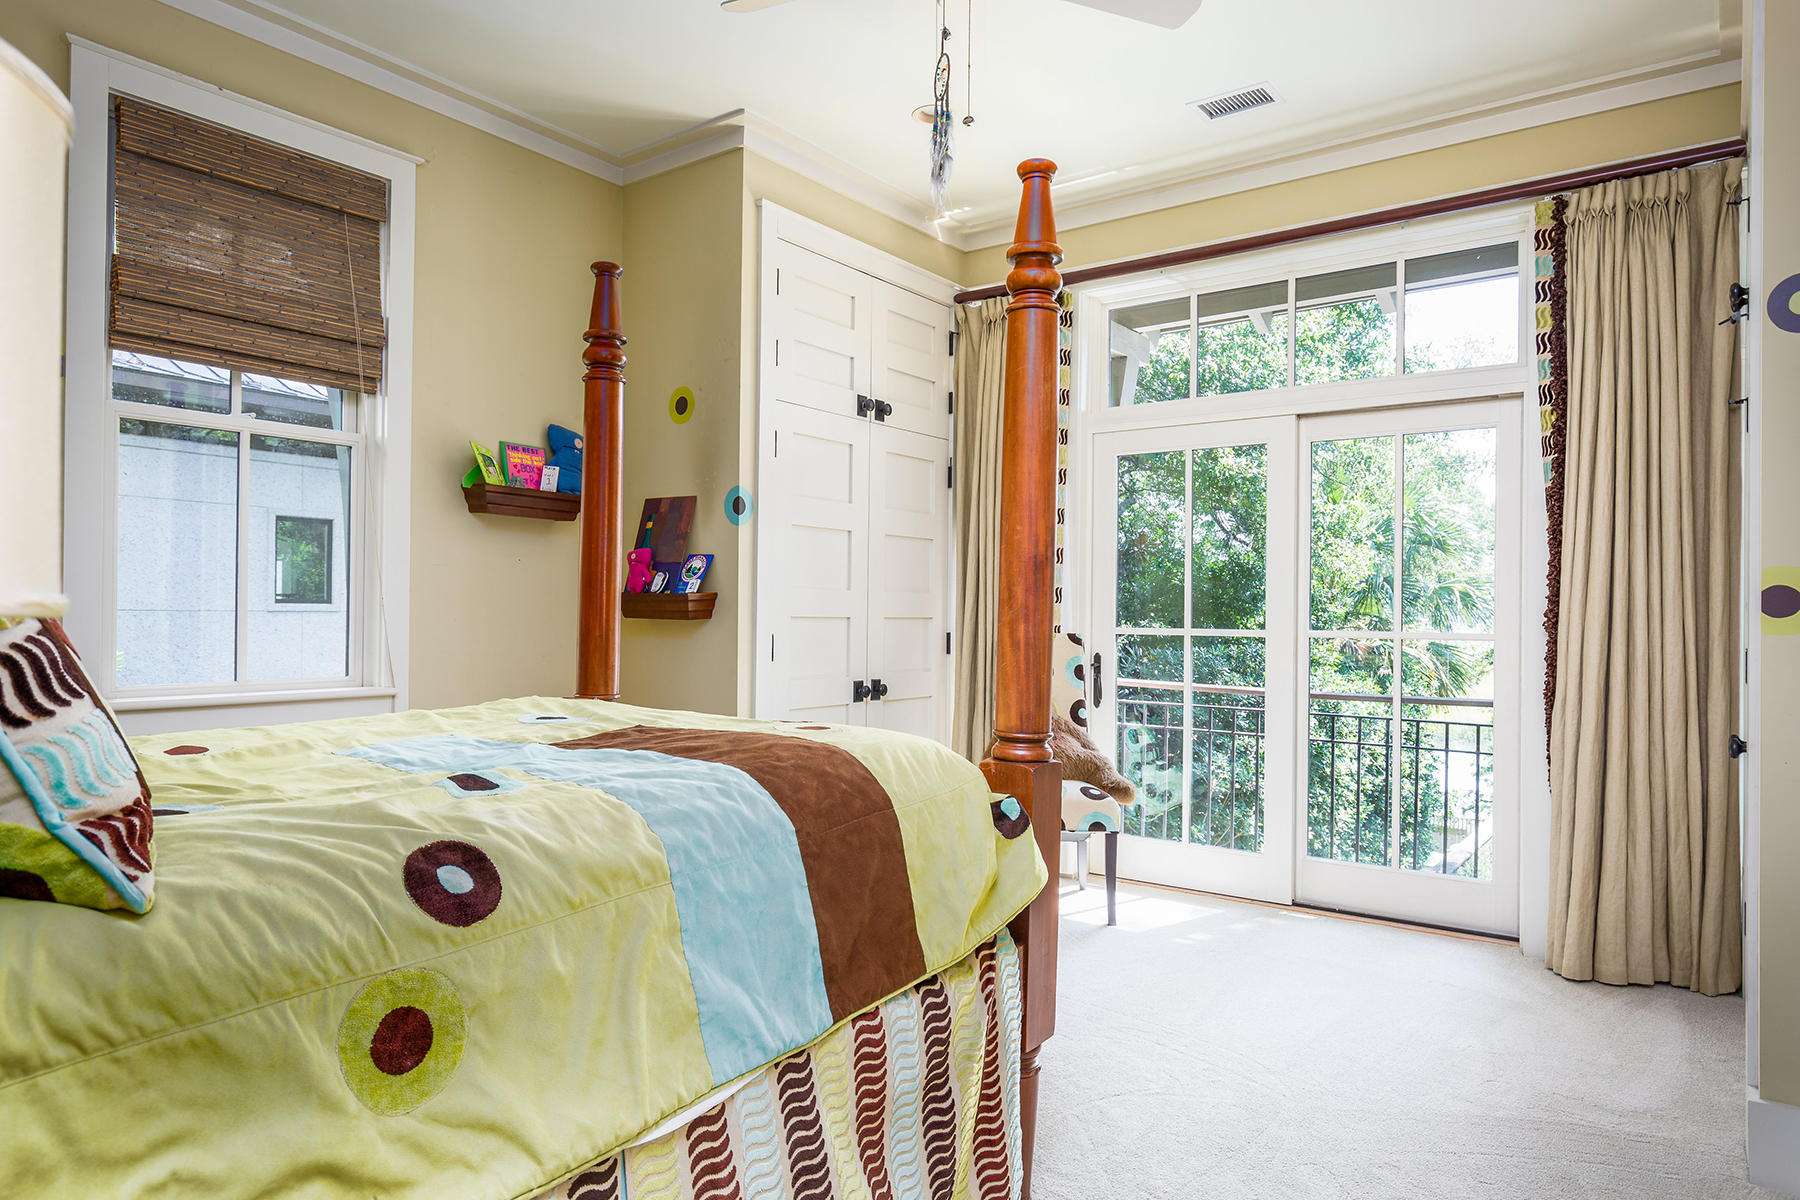 Ellis Oaks Homes For Sale - 672 Ellis Oak, Charleston, SC - 44